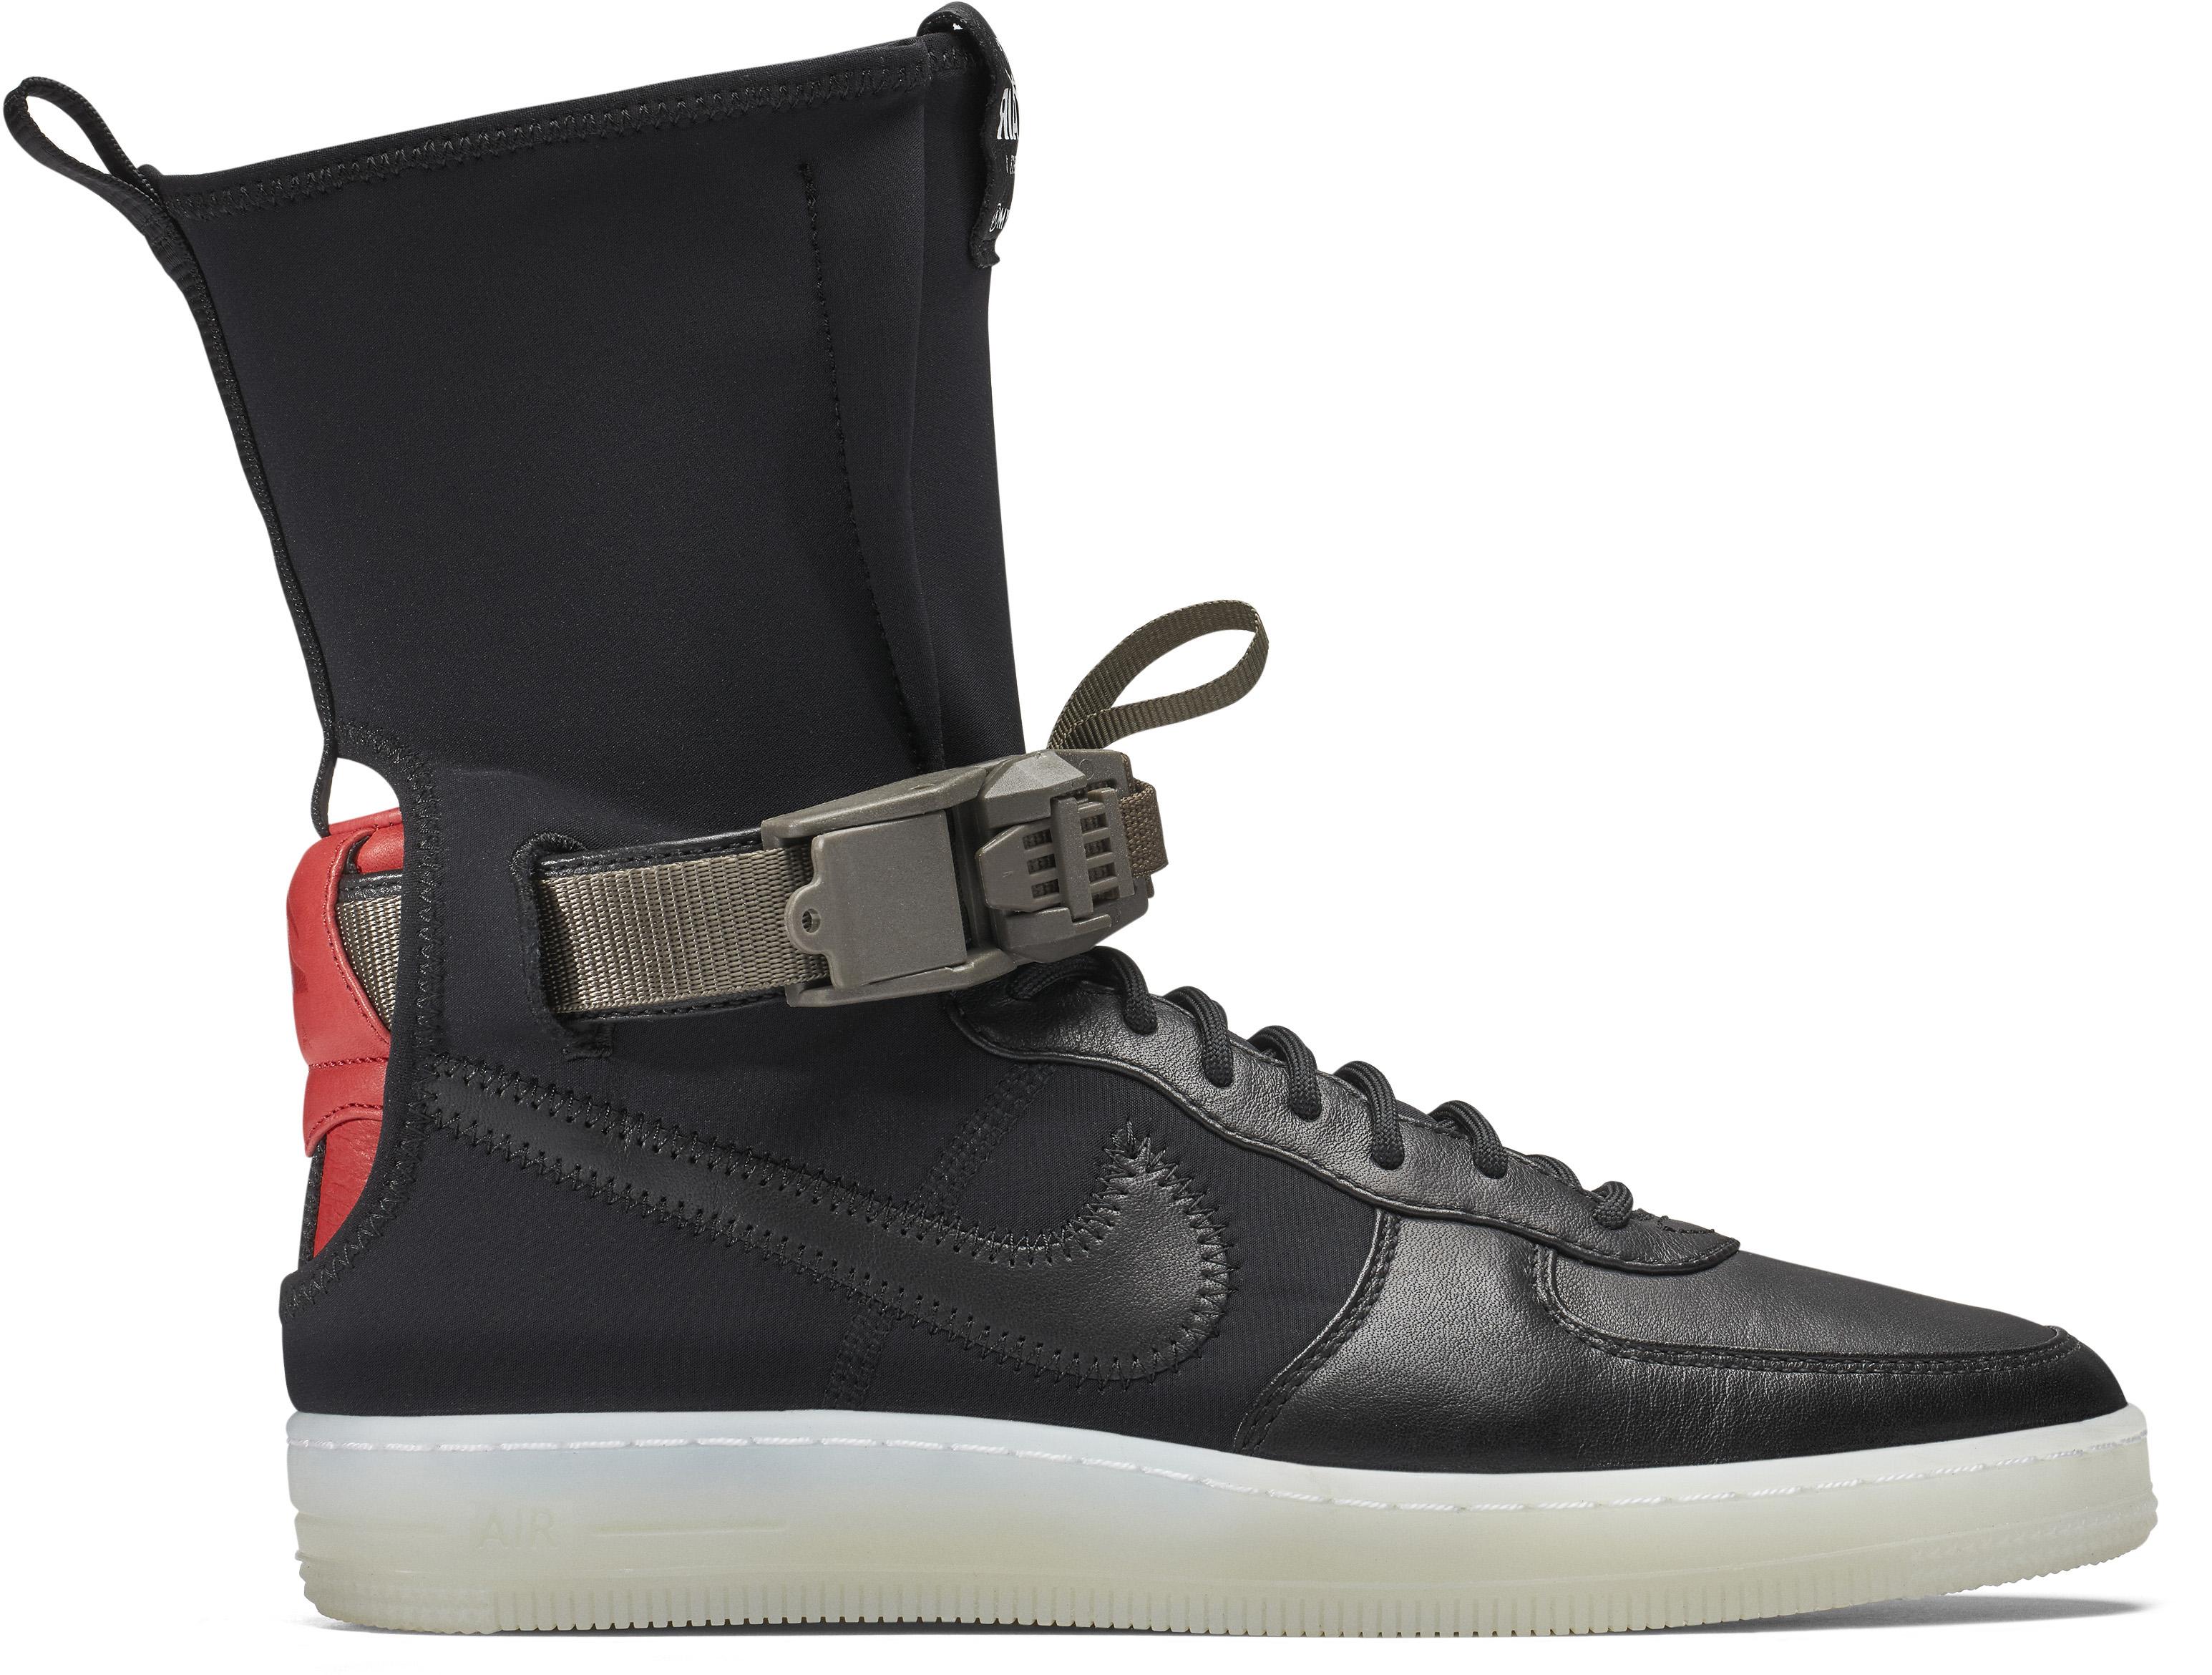 Nike Air Force 1 Downtown Acronym Black